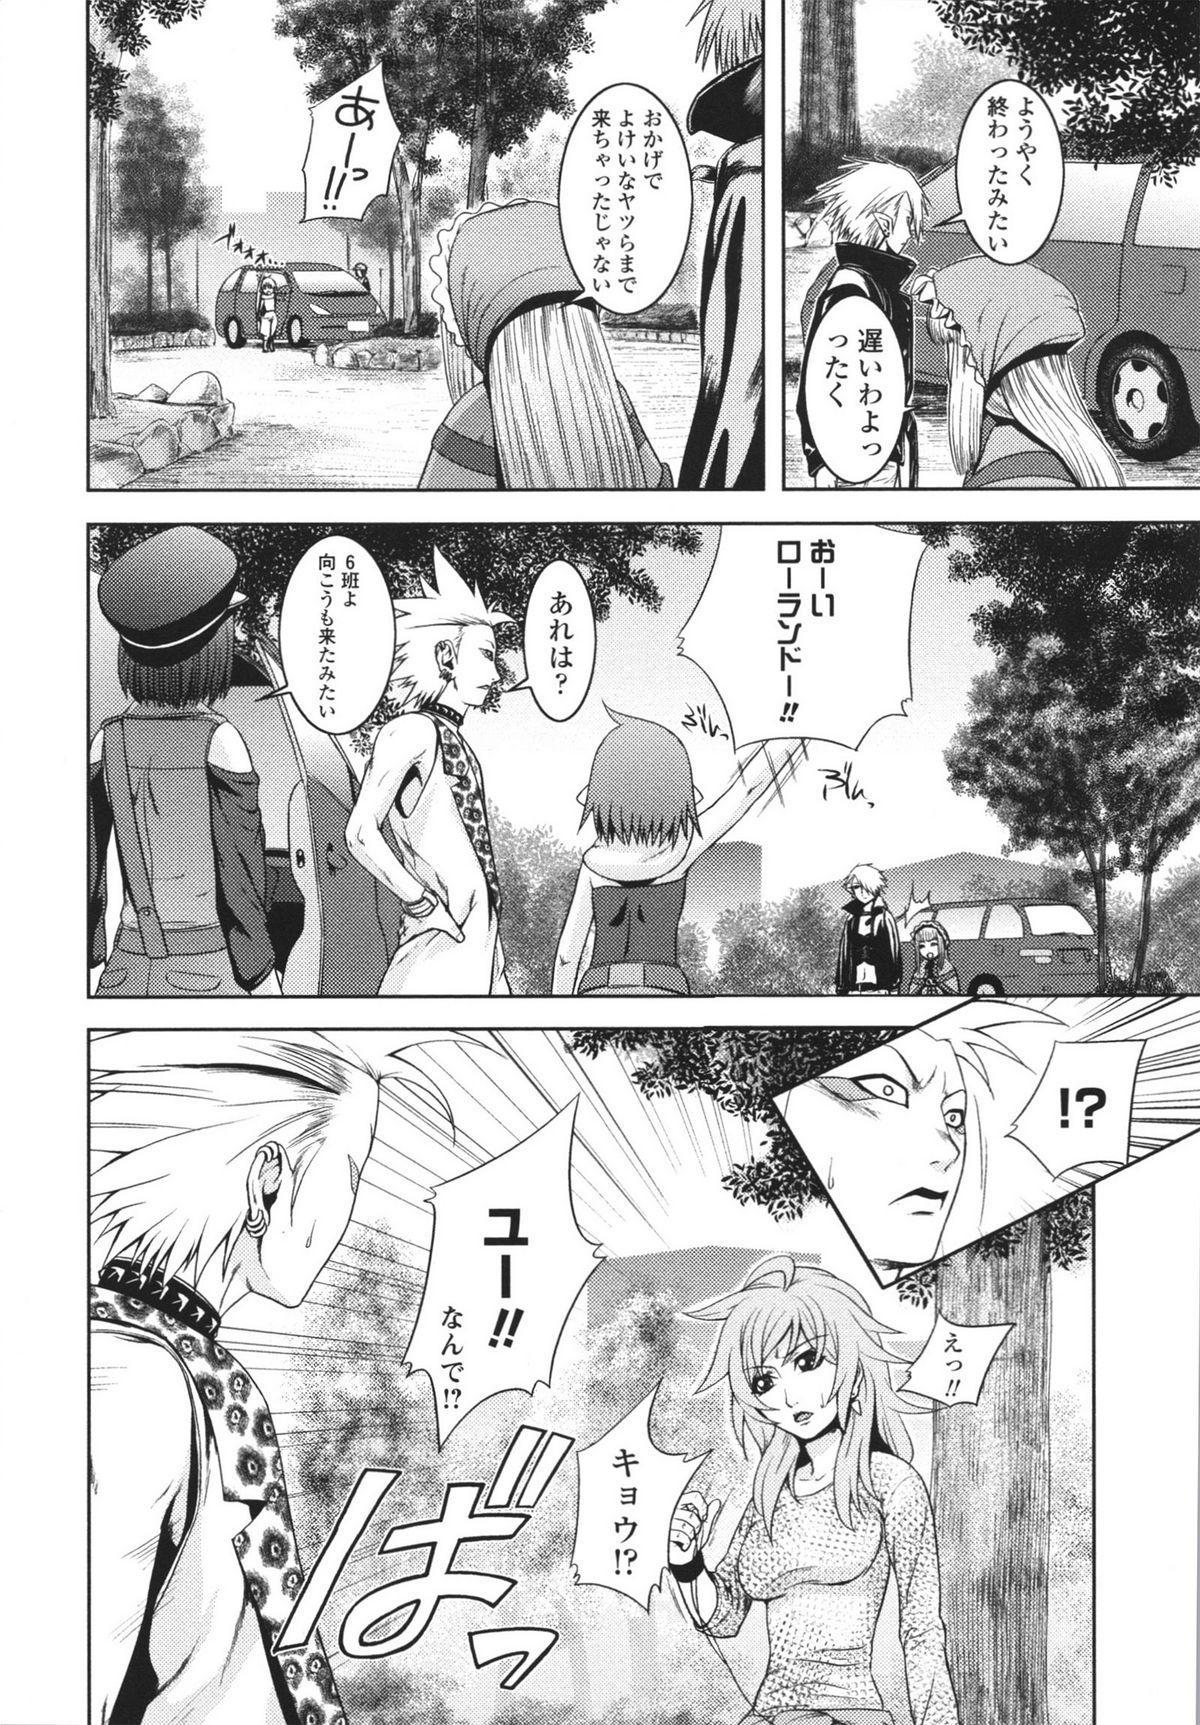 [Kawazuko Chouji] m7 -Minor Seven- Jou 117